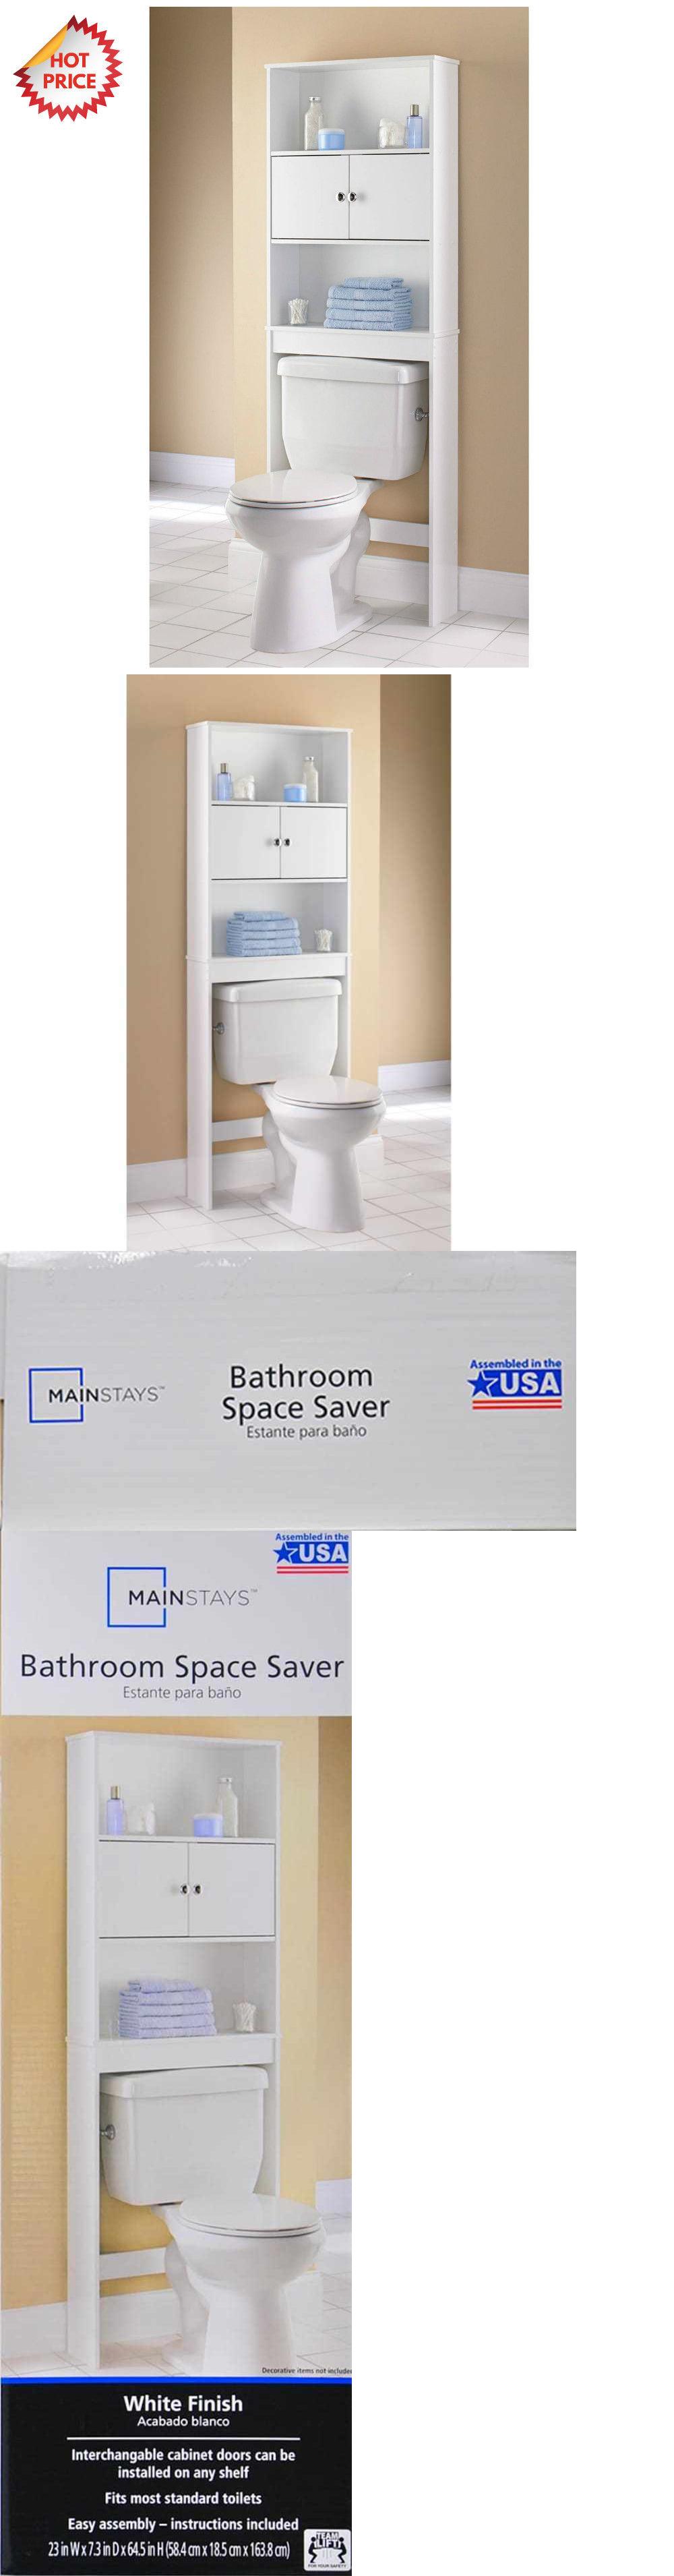 Over The Toilet Bathroom Organizers bath caddies and storage 54075: 3 shelf bathroom organizer over